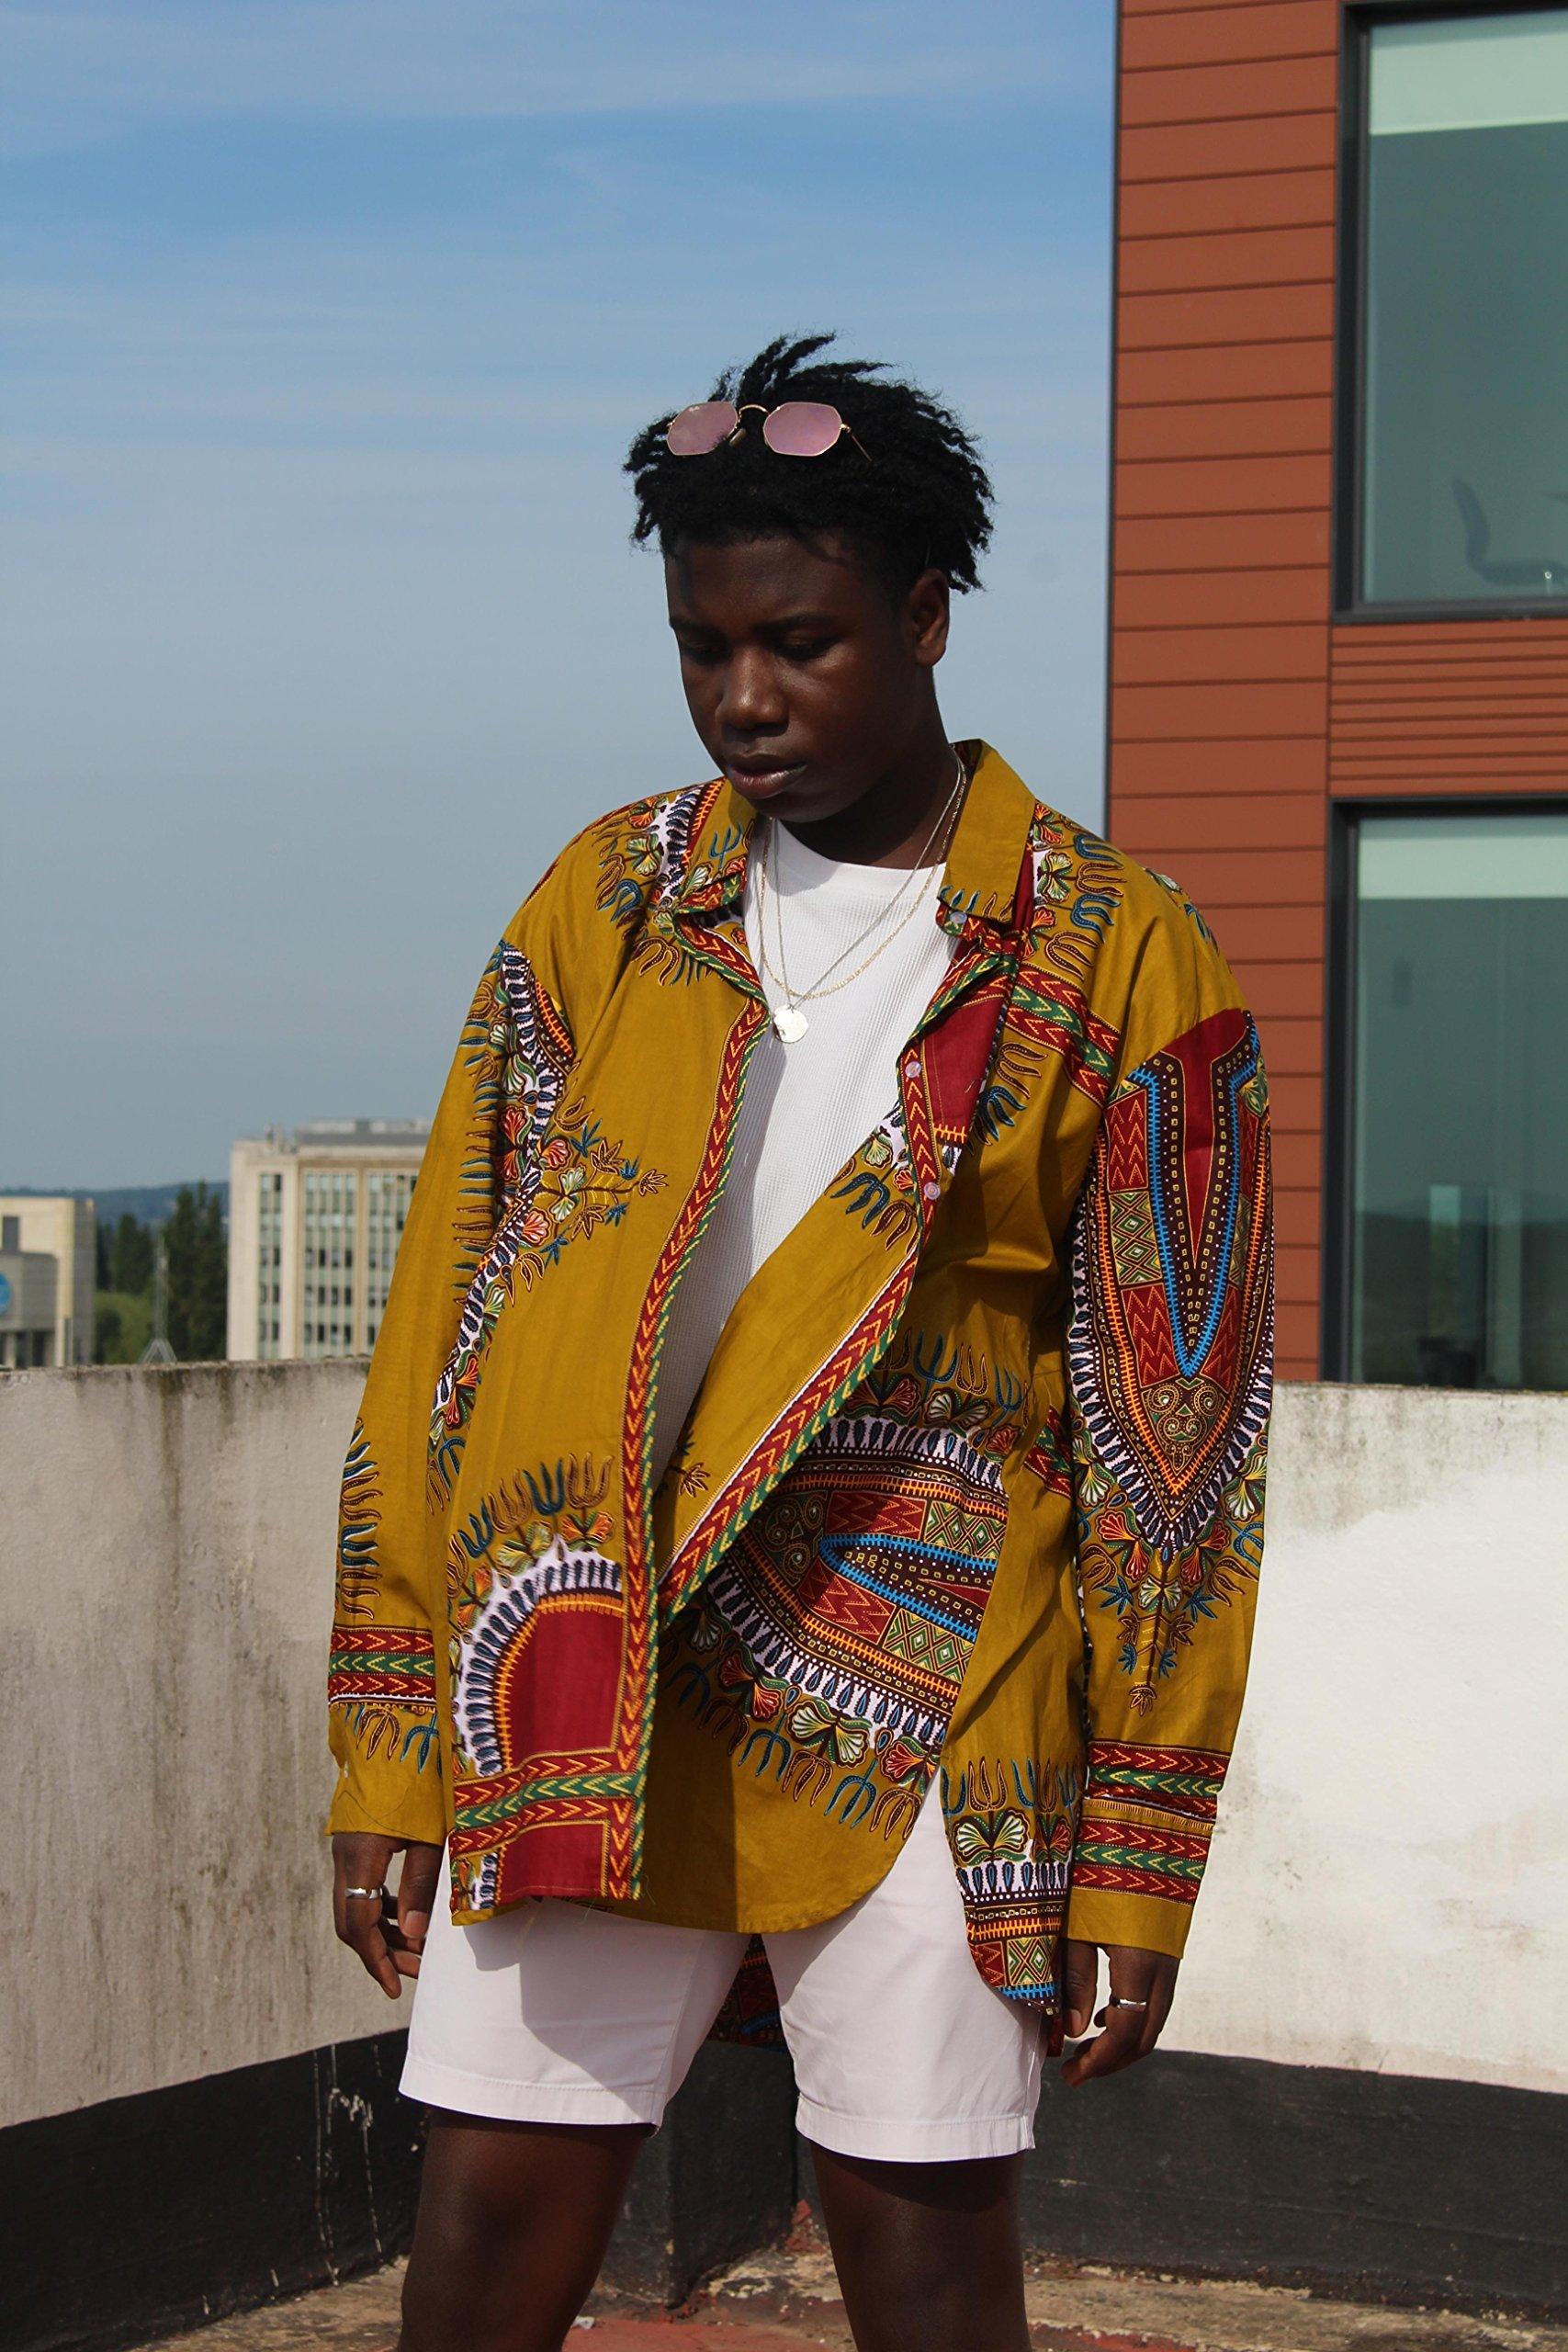 African Longline Shirt Dashiki Shirt Festival Clothing African Clothing African Shirt Summer Shirt Festival Shirt Wax Print Shirt Unisex